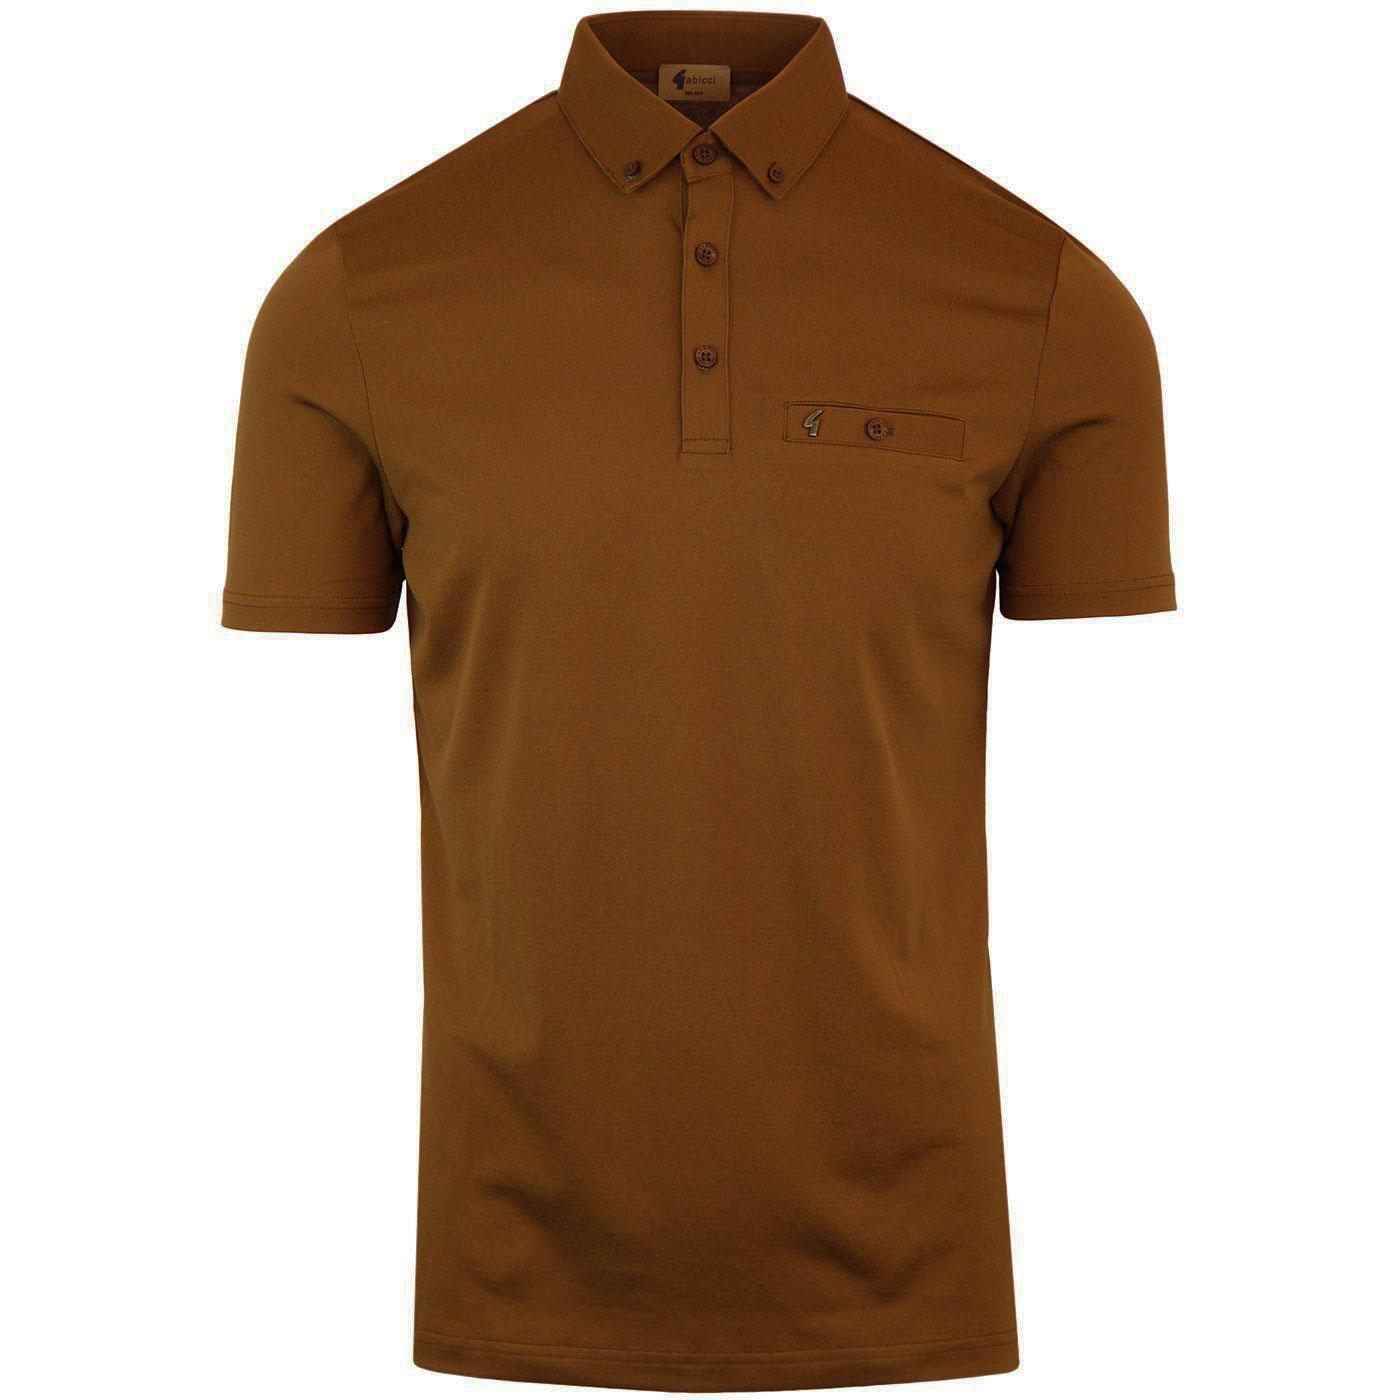 Ladro GABICCI VINTAGE Classic Polo Shirt HONEYCOMB